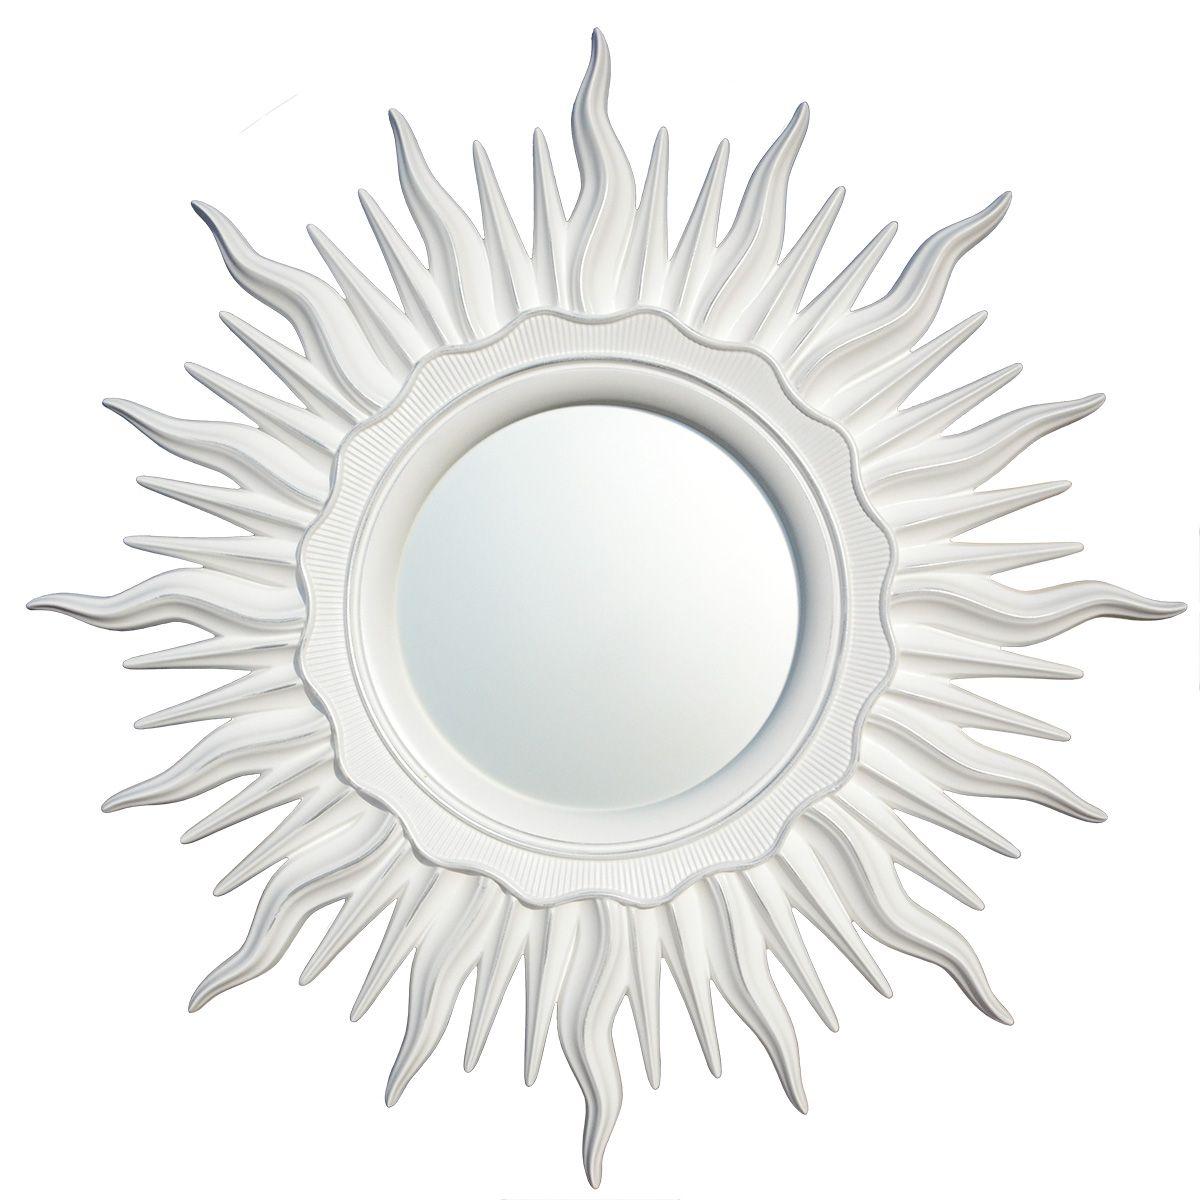 Зеркало VezzoLLi Астро, цвет: белый, диаметр 96 см11-66